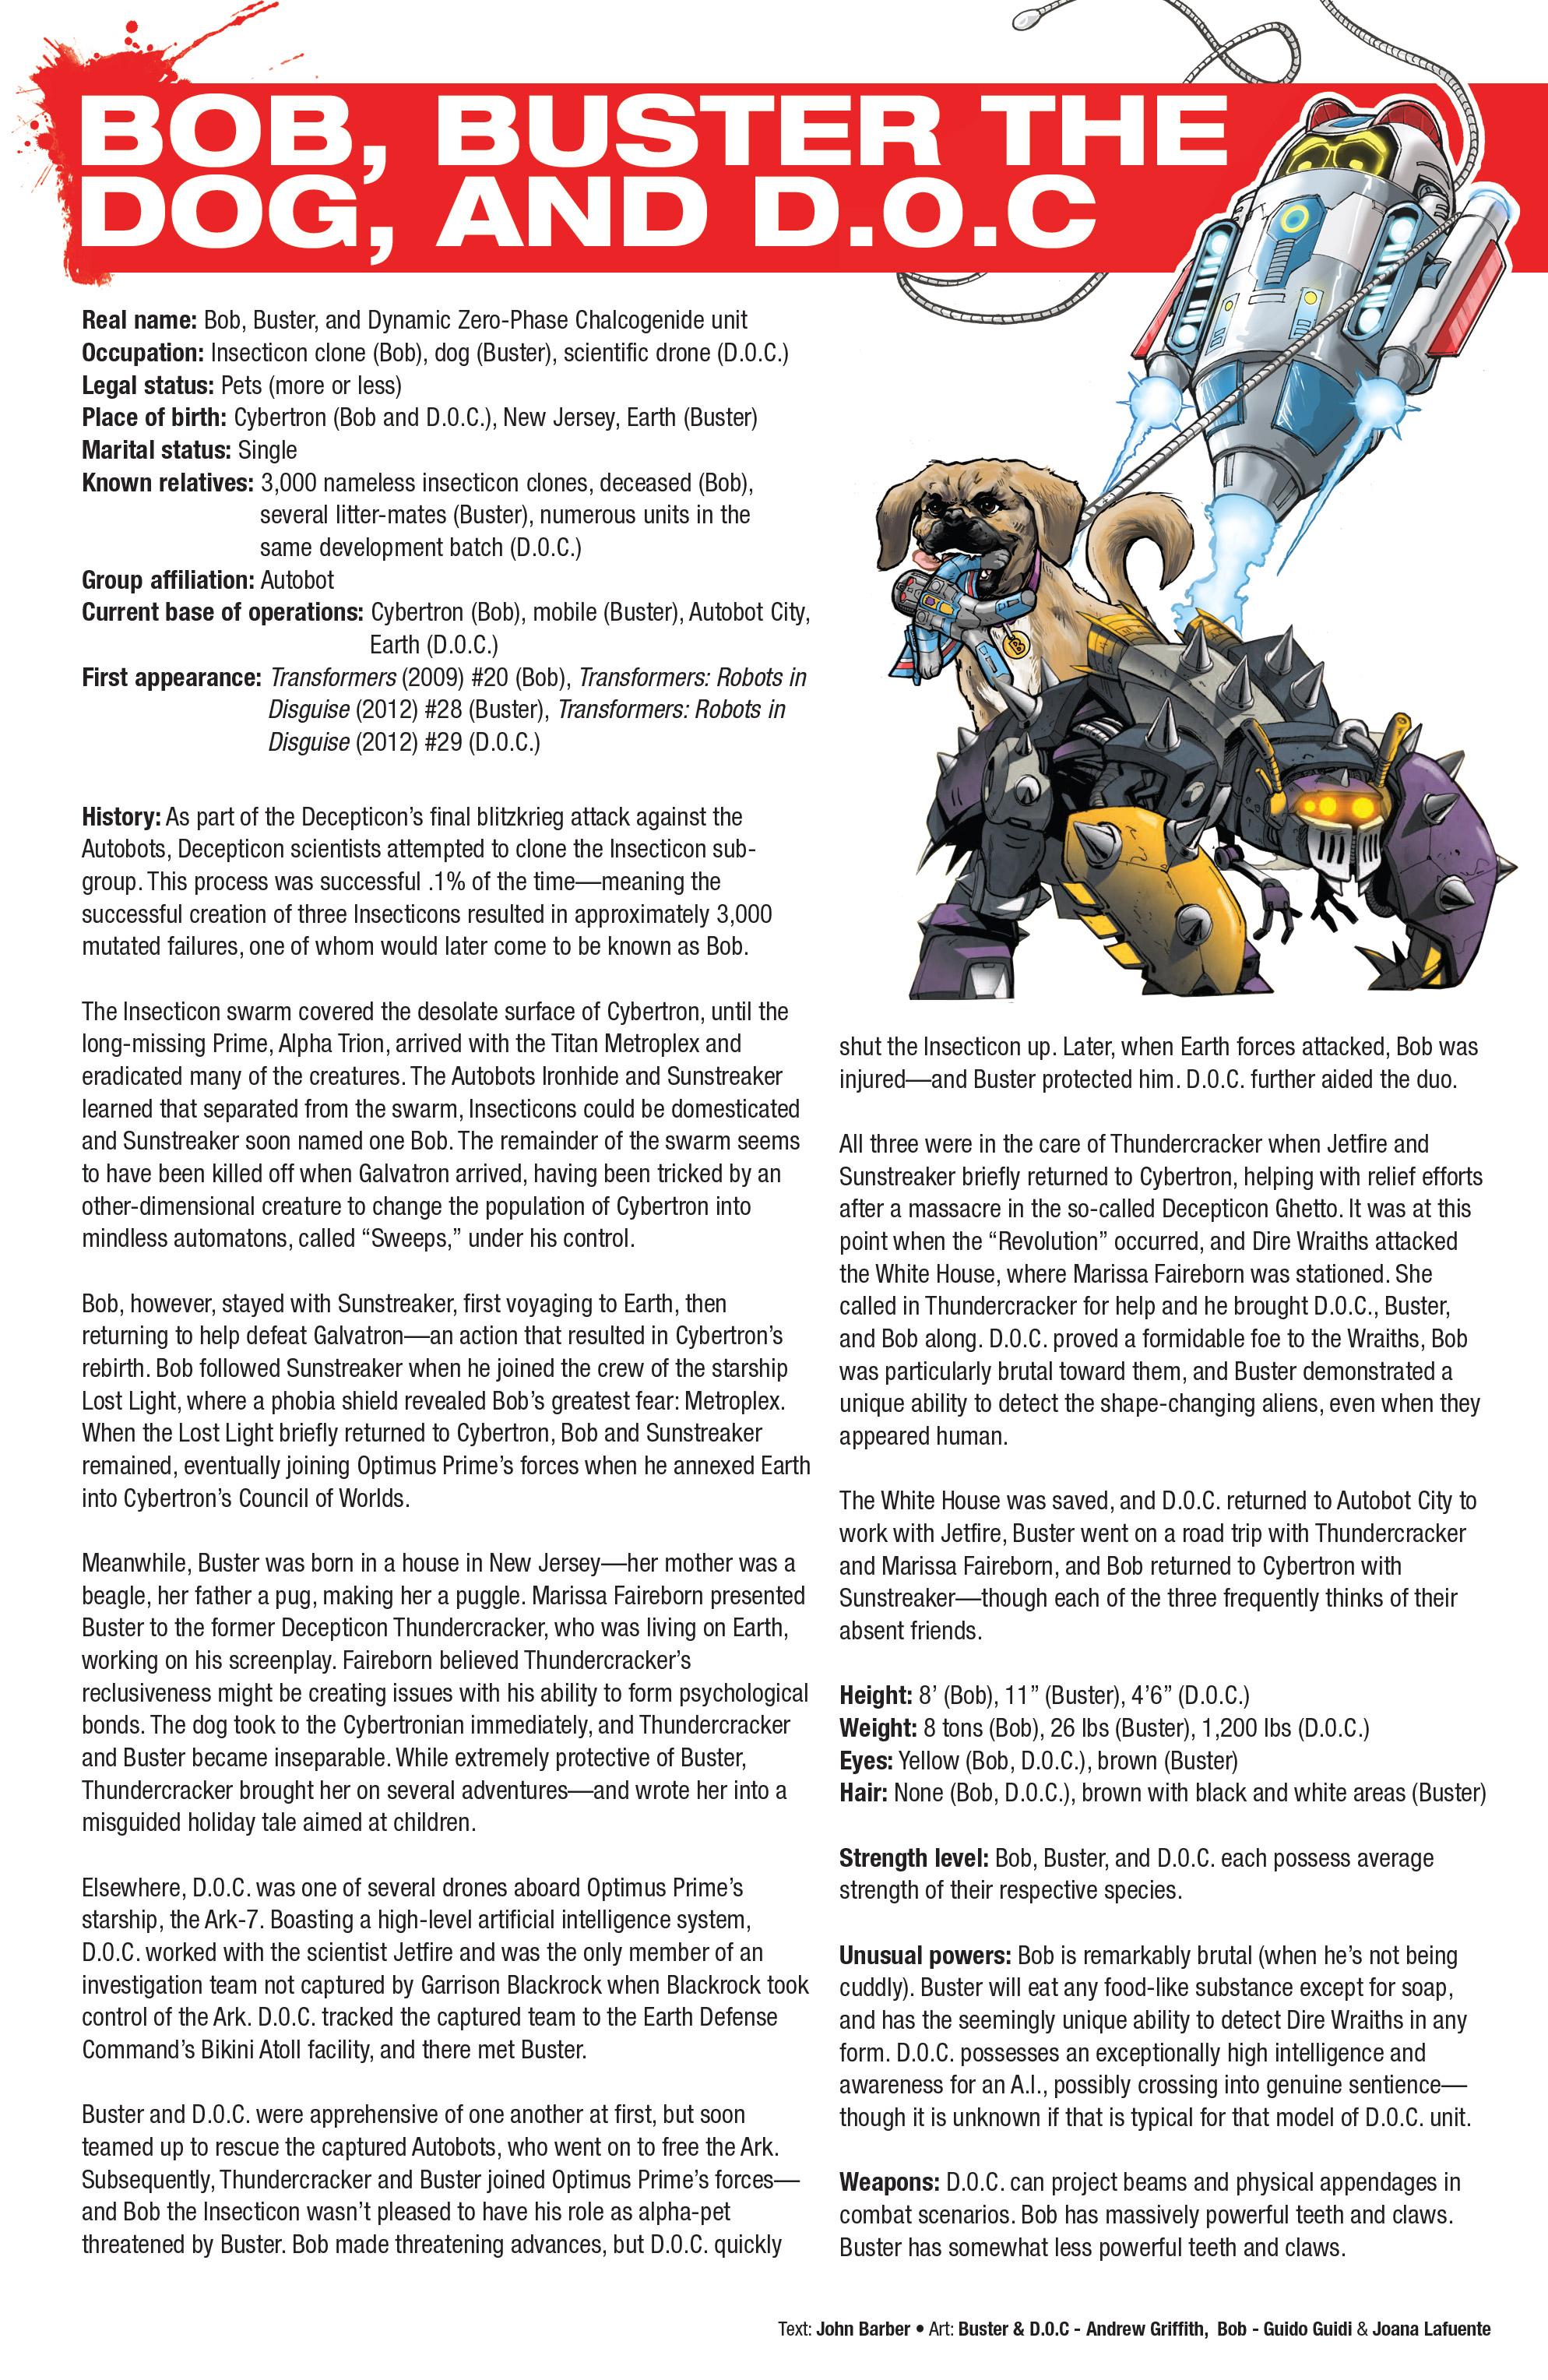 Read online Hasbro Heroes Sourcebook comic -  Issue #1 - 25